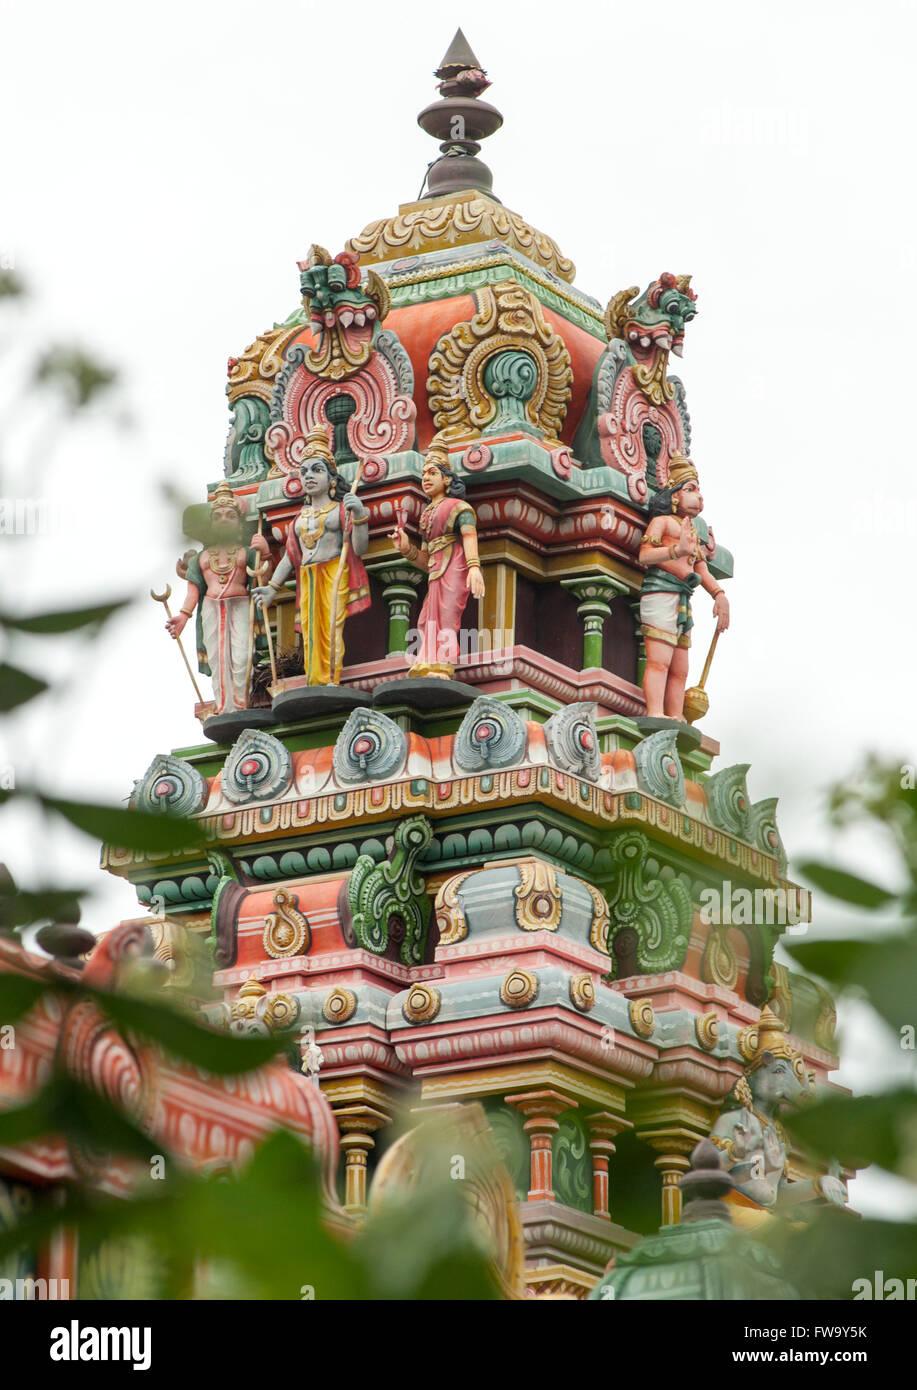 Hindu temple at Bel Air in Mauritius. - Stock Image